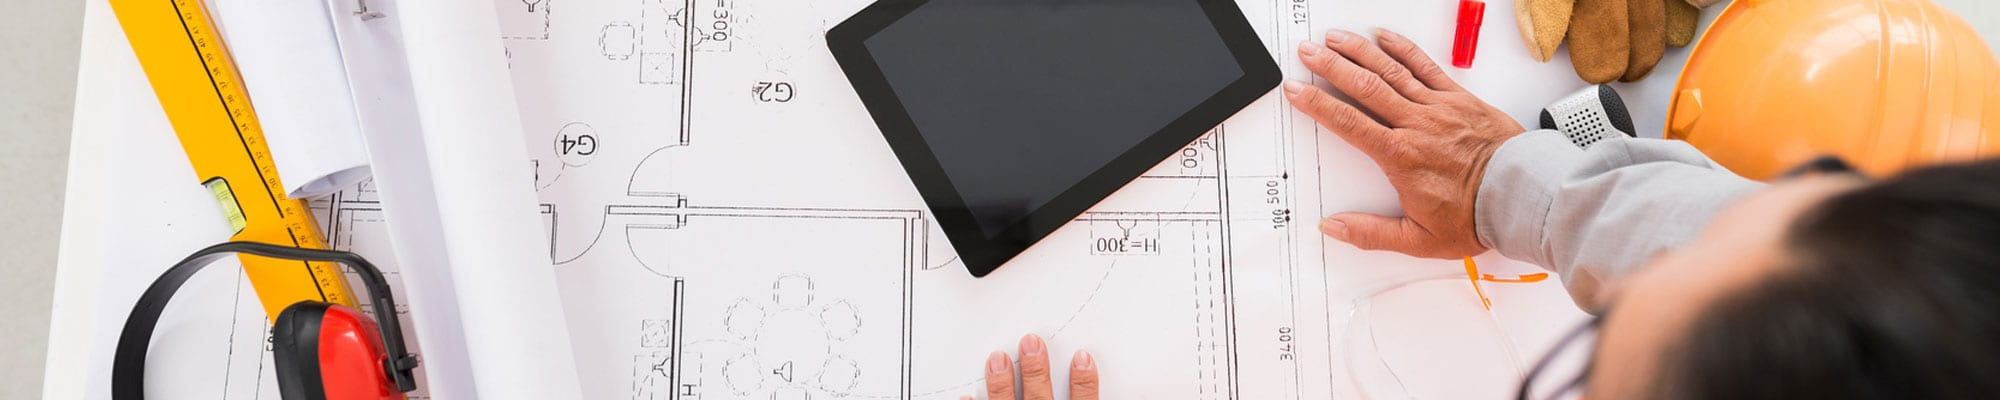 coaching para fabricantes de materiales de construcción